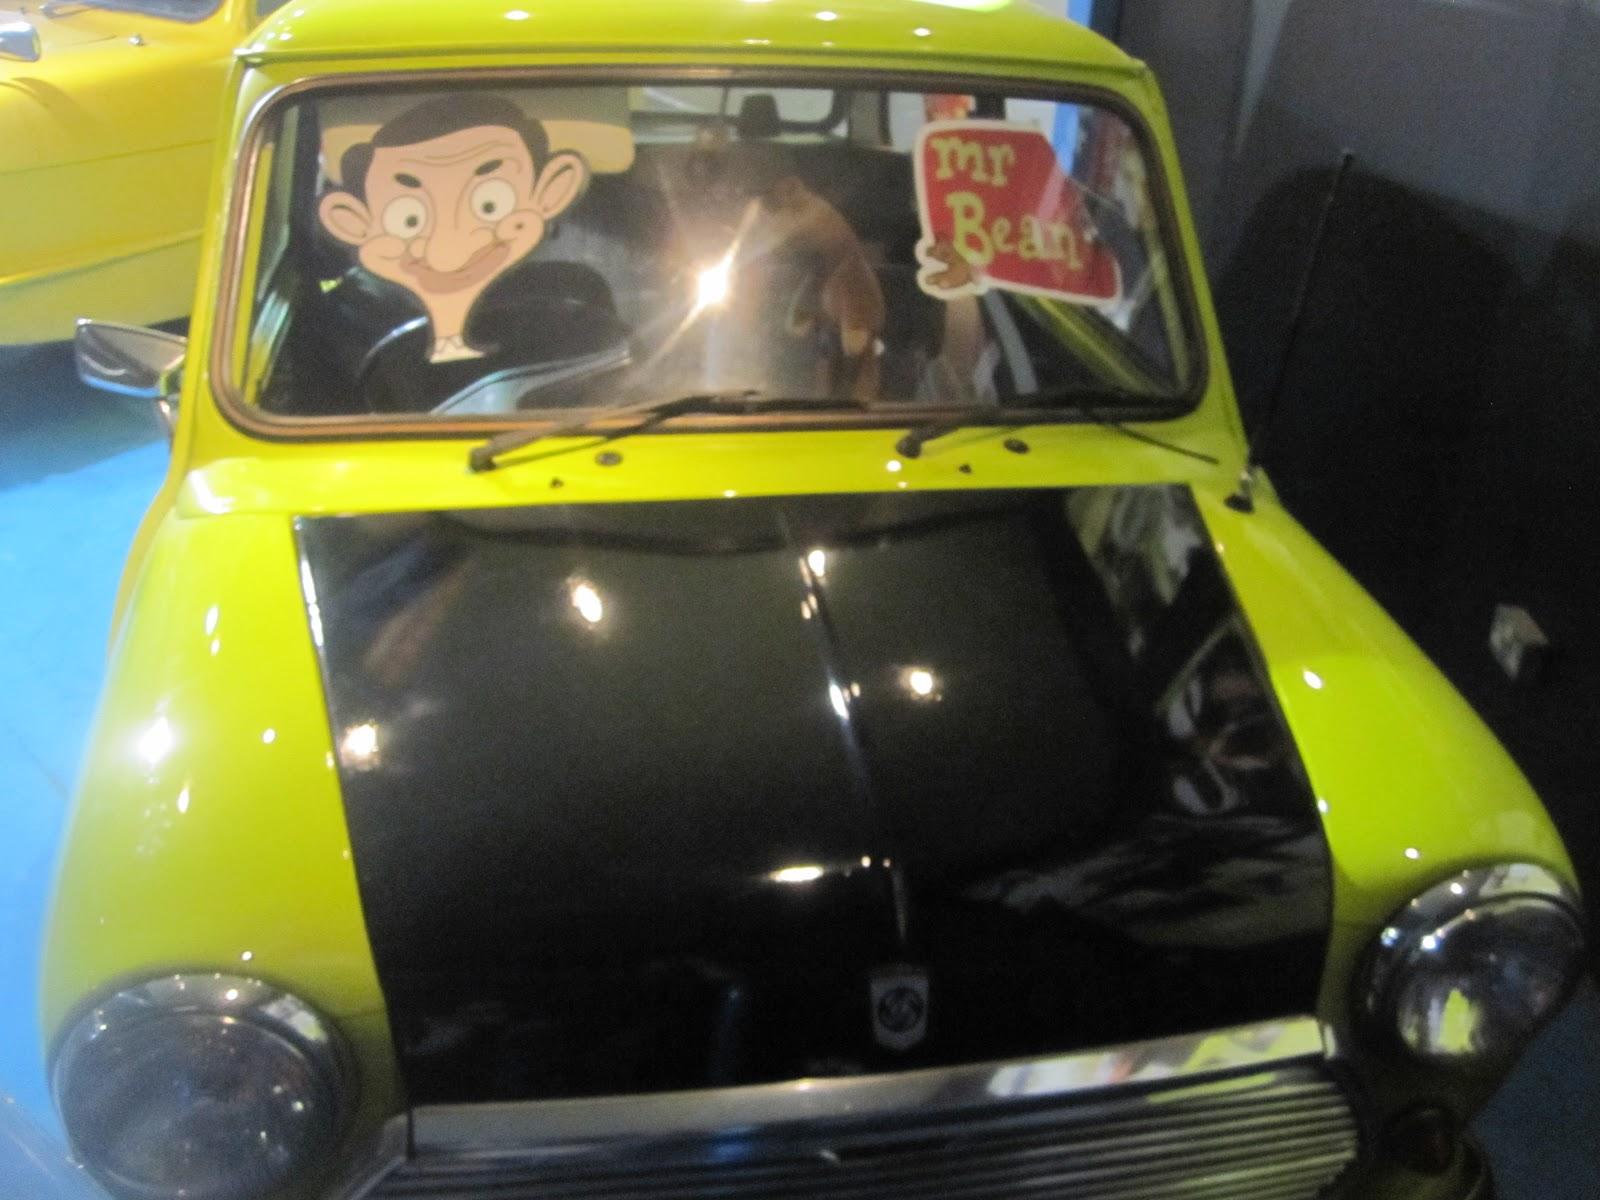 Pin Mr Bean Tumblr On Pinterest